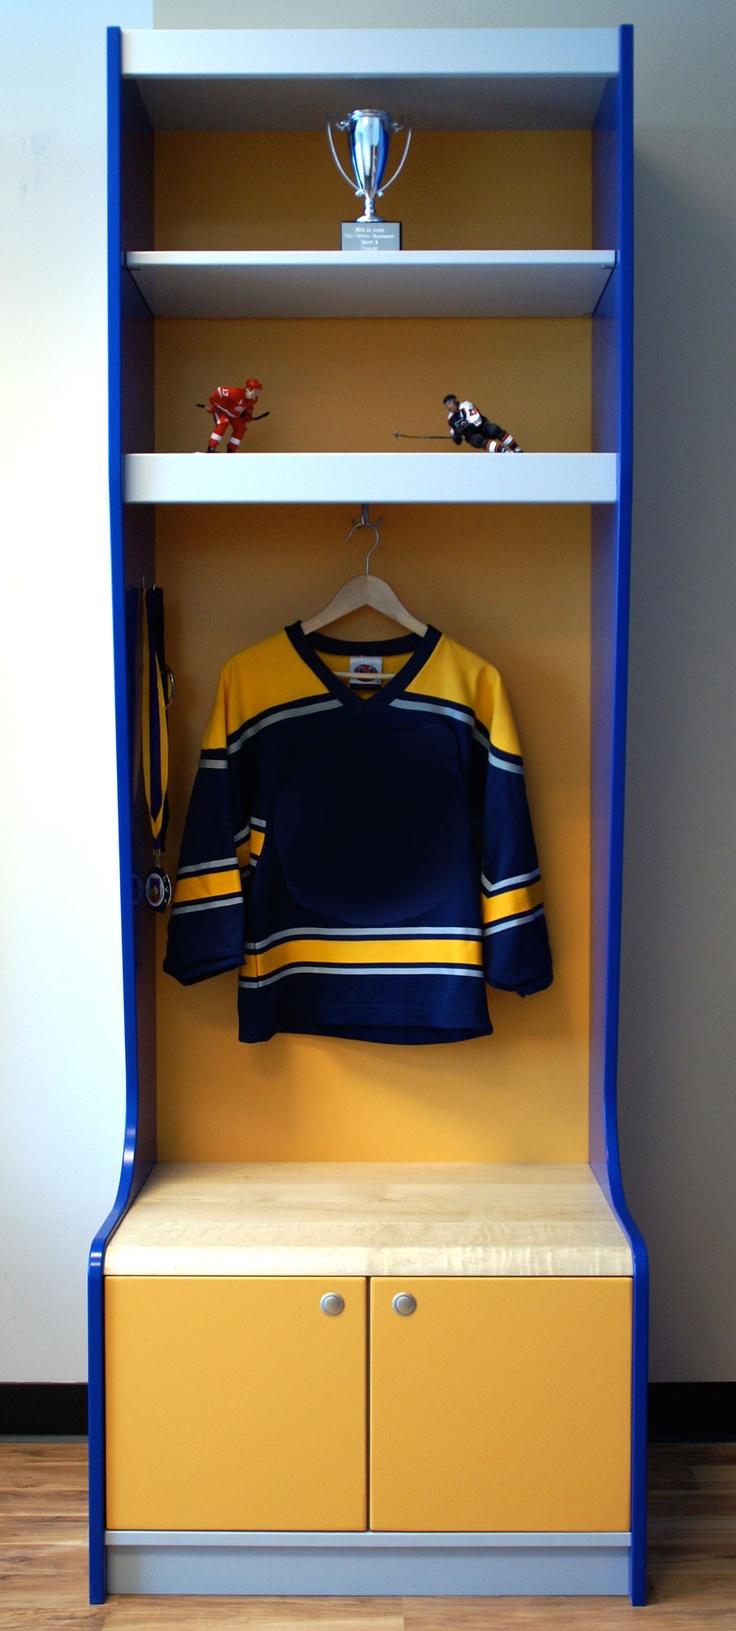 Comsports Locker For Kids Room : Sport Locker- Yellow, Grey and Blue Sport locker for your kids room ...